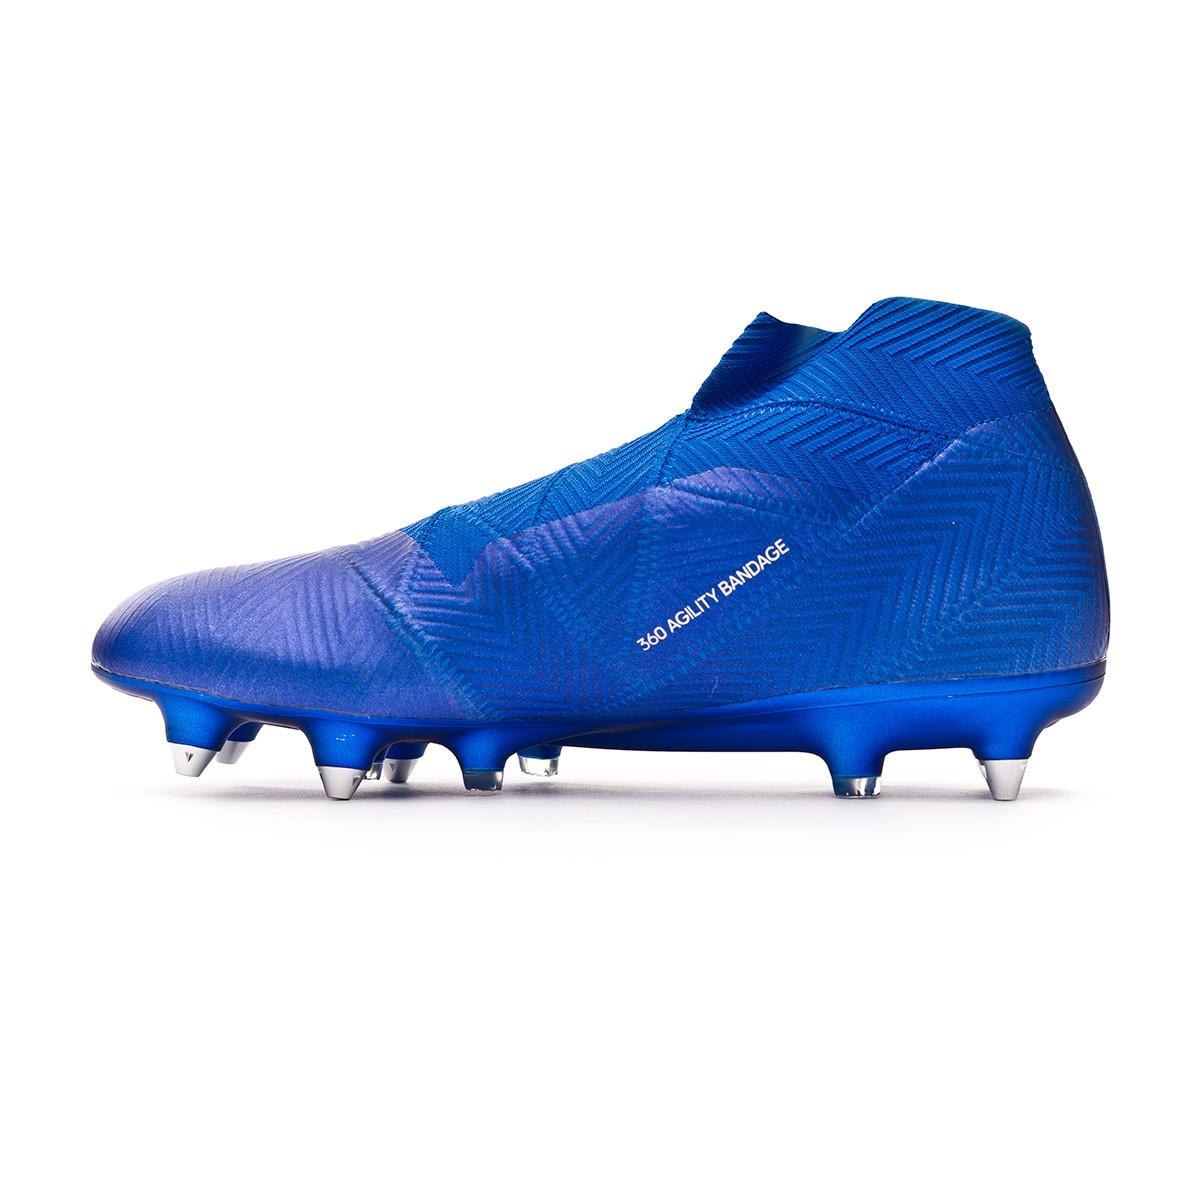 competitive price c3e0b b4c4f Football Boots adidas Nemeziz 18+ SG Football blue-White - Tienda de fútbol  Fútbol Emotion